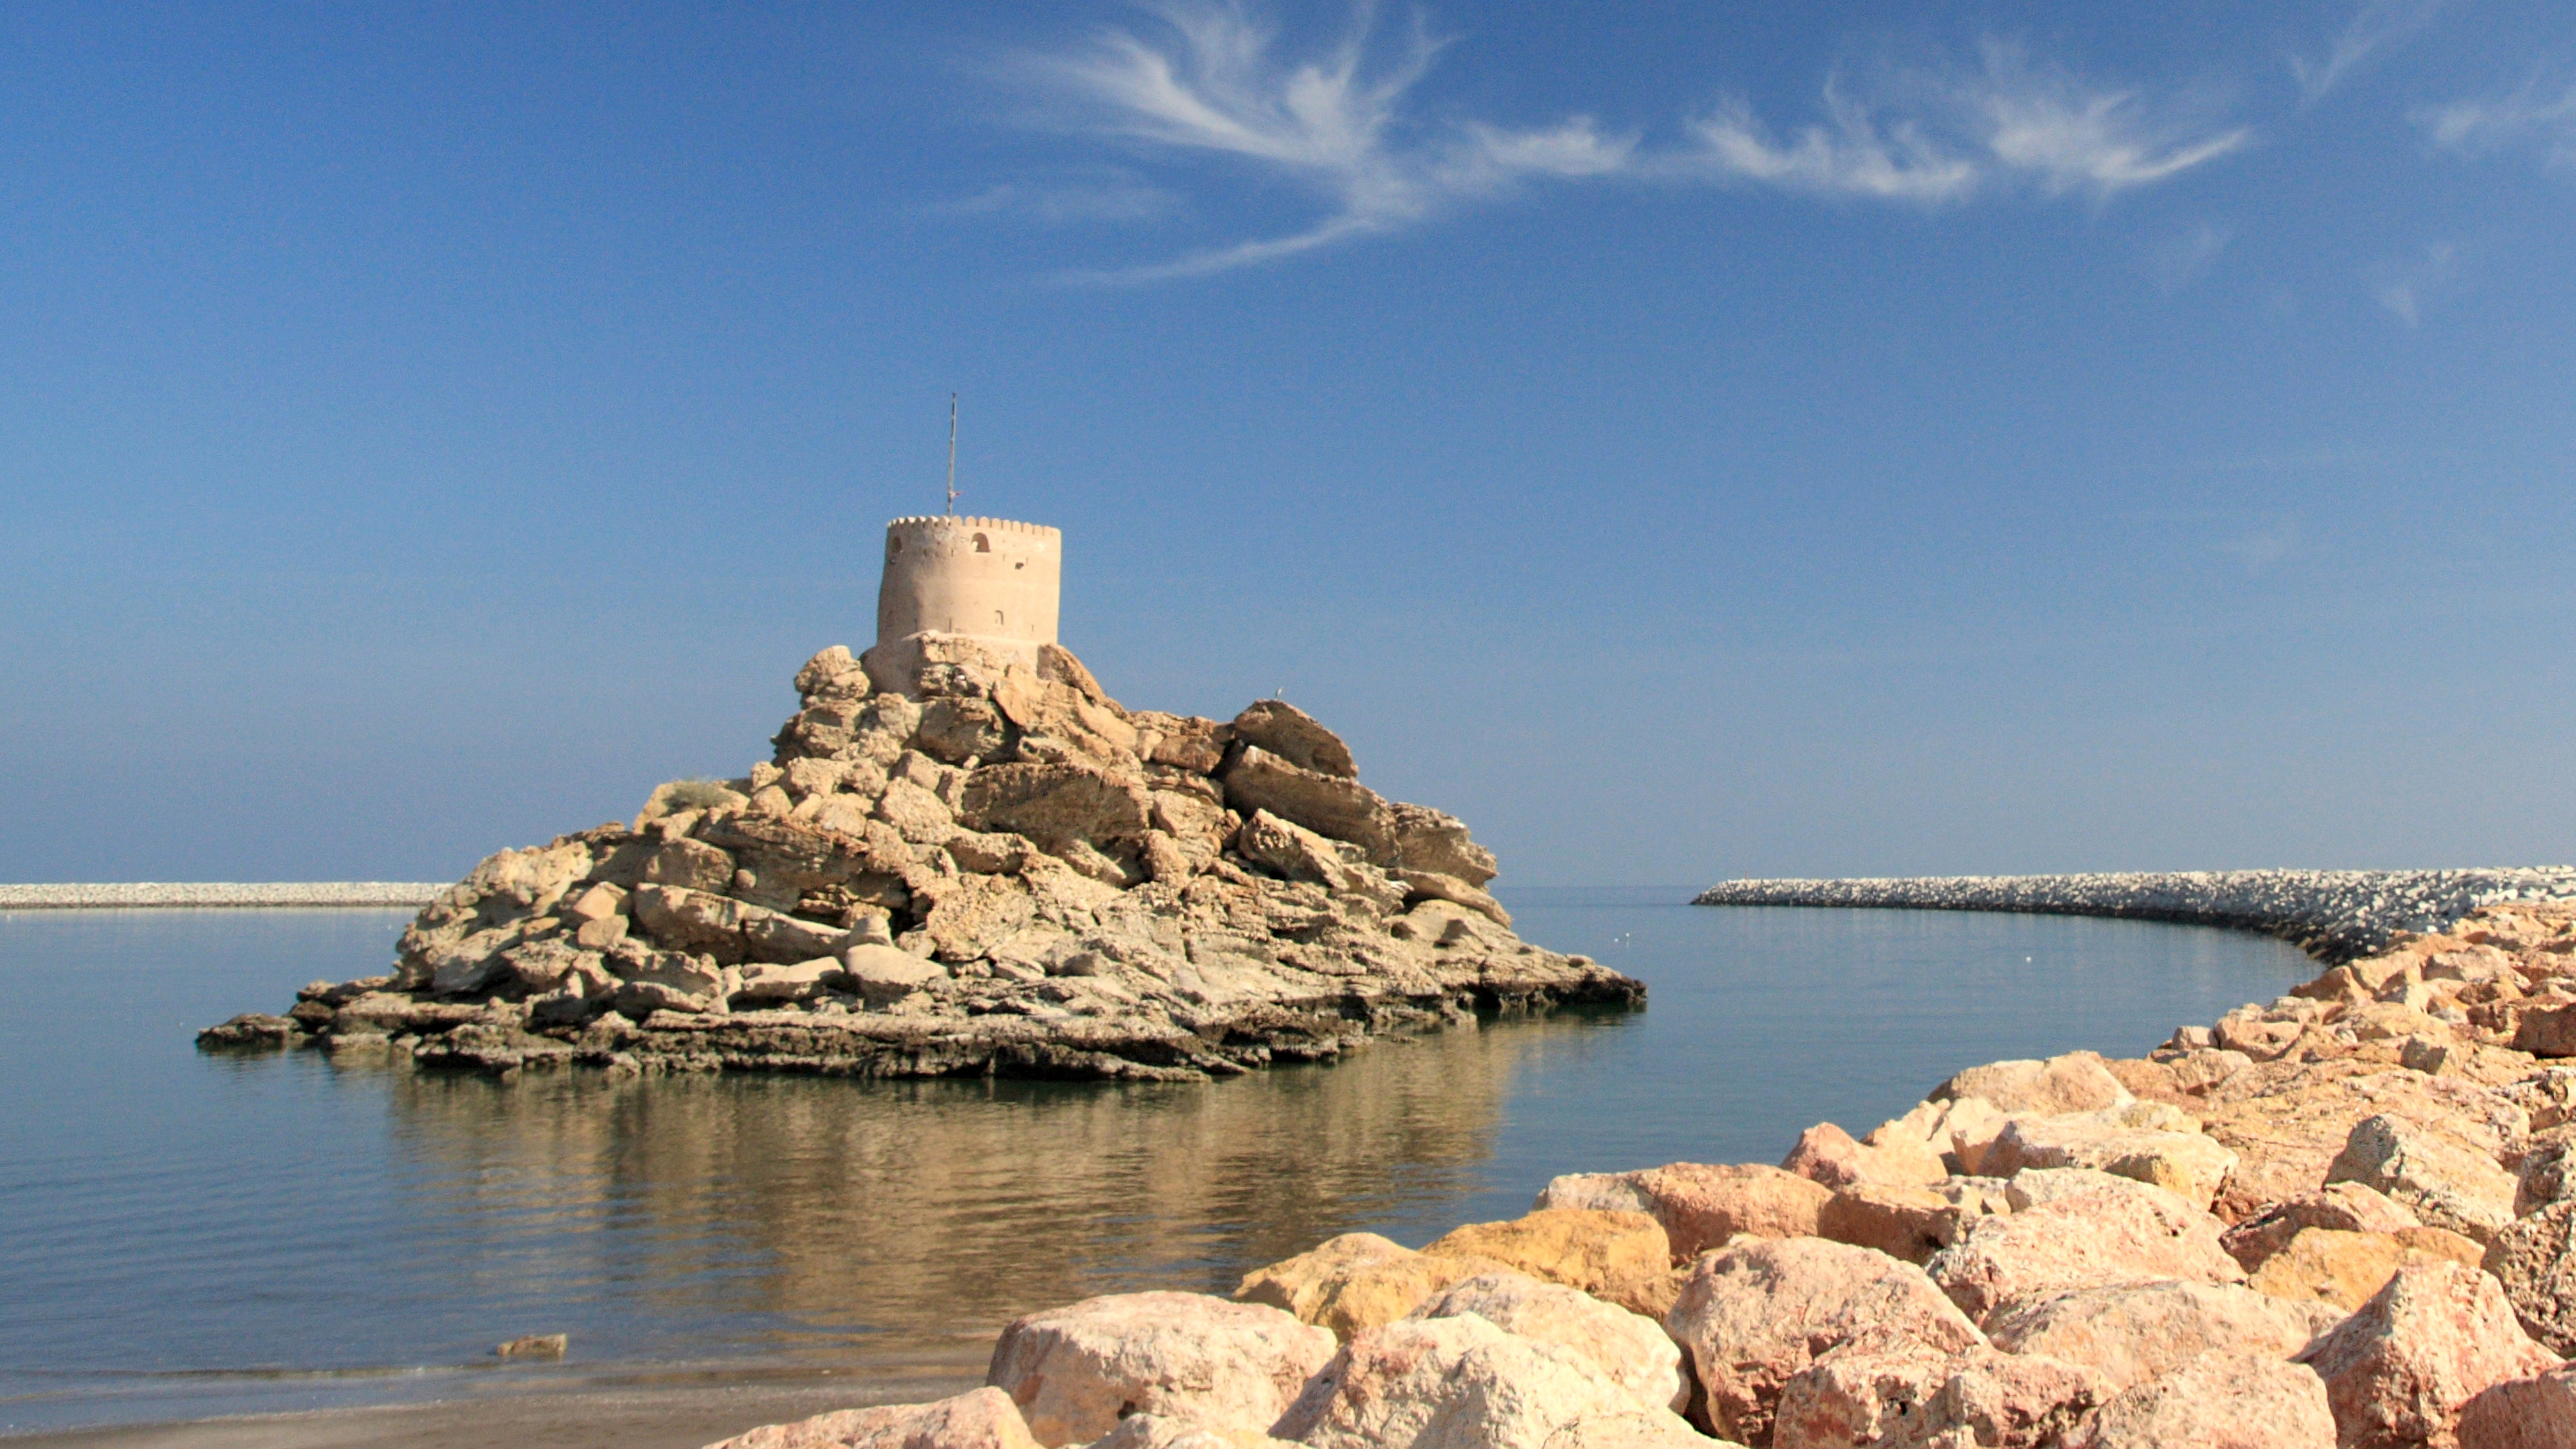 Quriyat, Oman, sets world record for highest 'low' temperature   CNN Travel